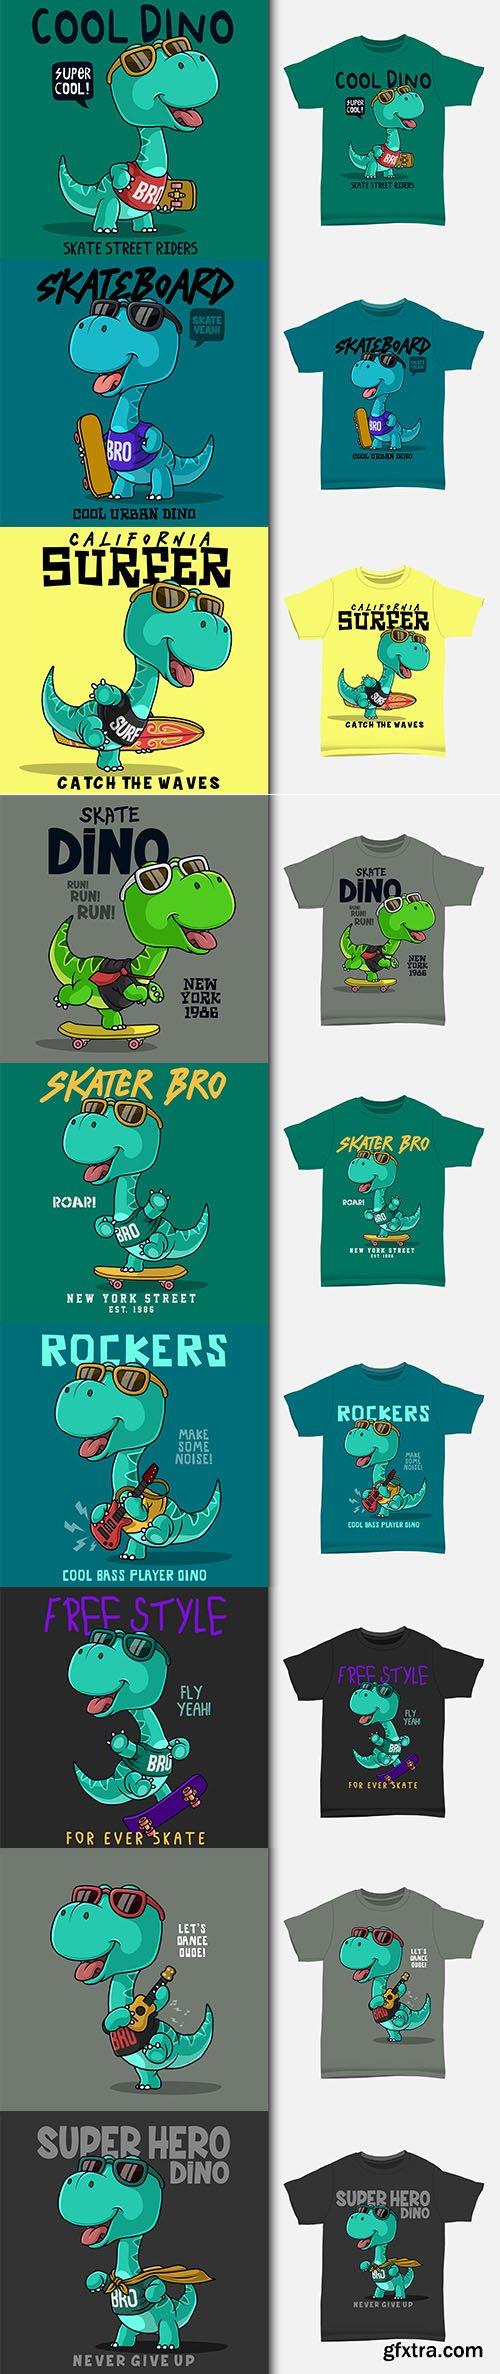 Dinosaur super hero cartoon t-shirt design